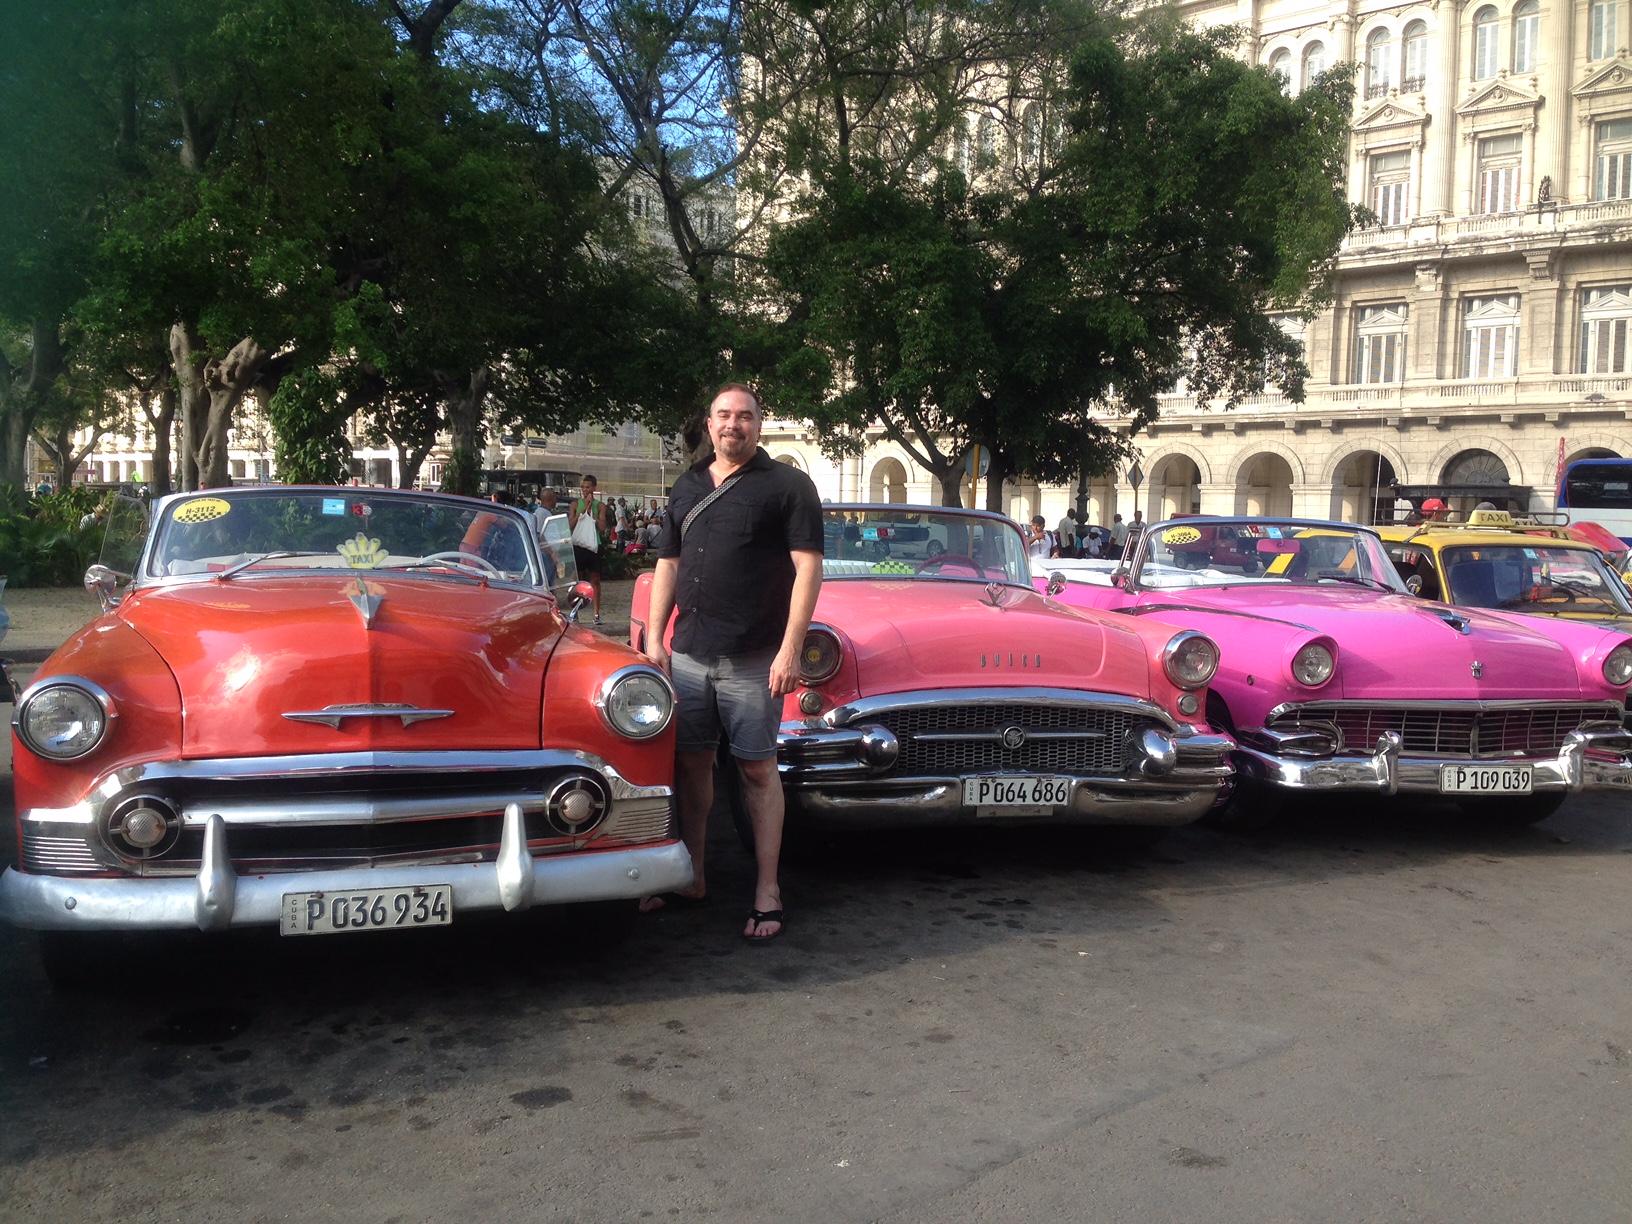 RWF Founder Jeff Cotter in Havana